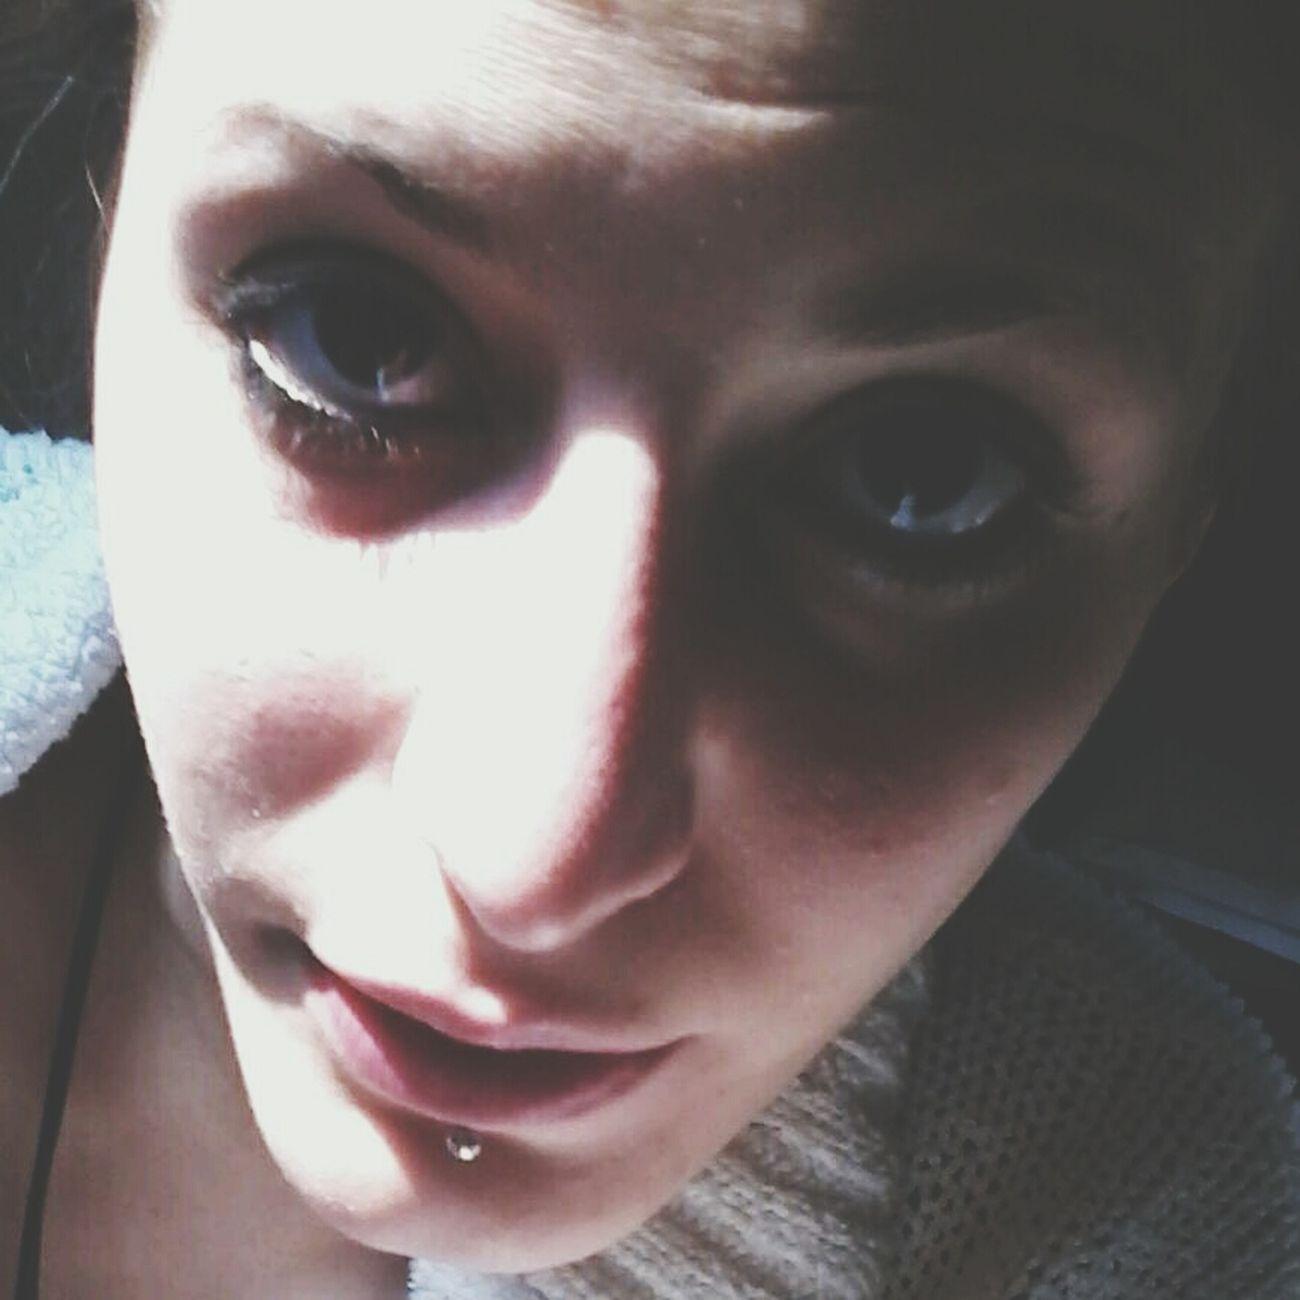 Vomito Appena Svegliata Piercing Occhiaie